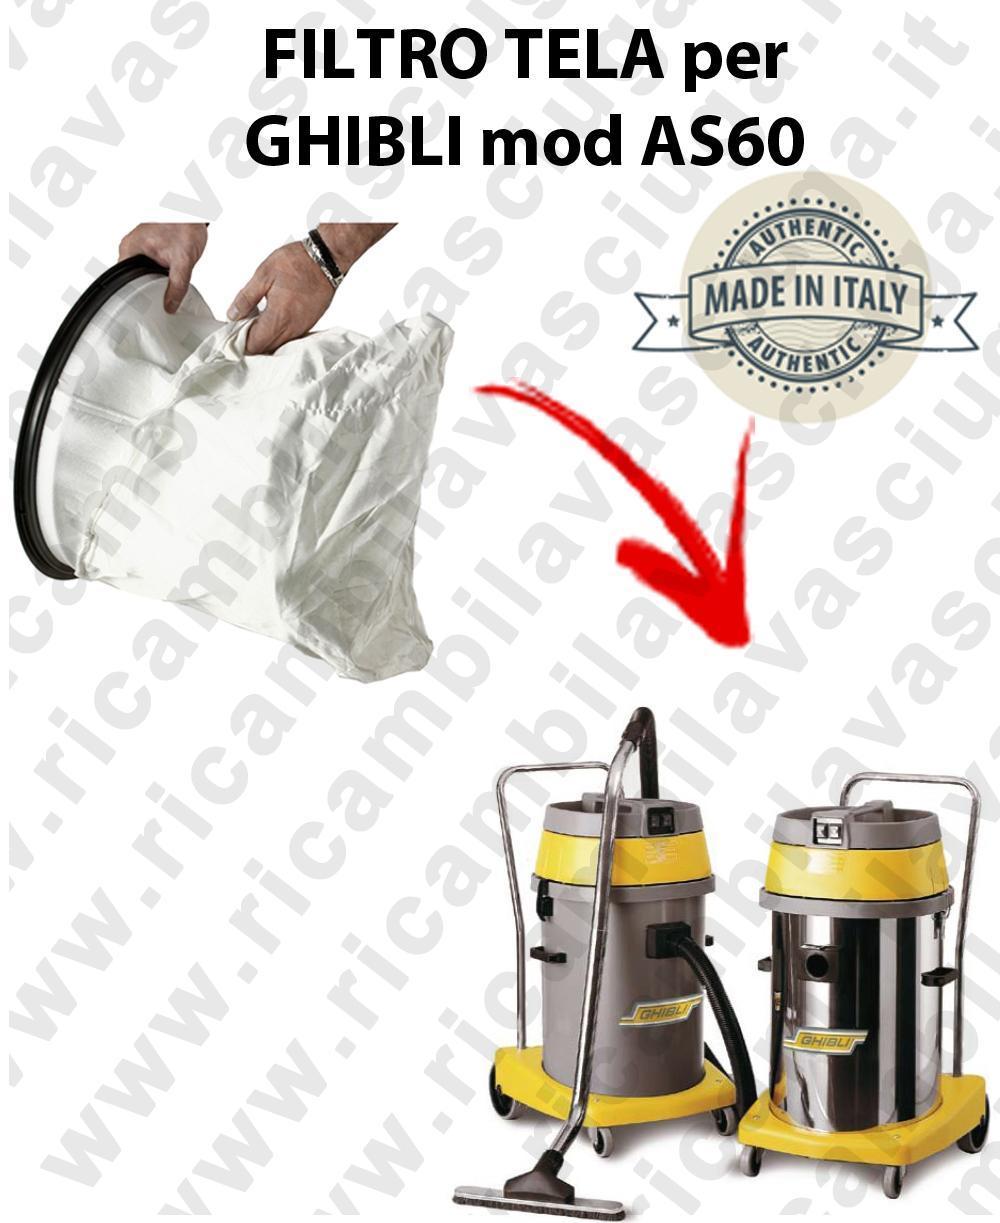 NYLON filter bag cod: 3001220 for vacuum cleaner GHIBLI model AS60